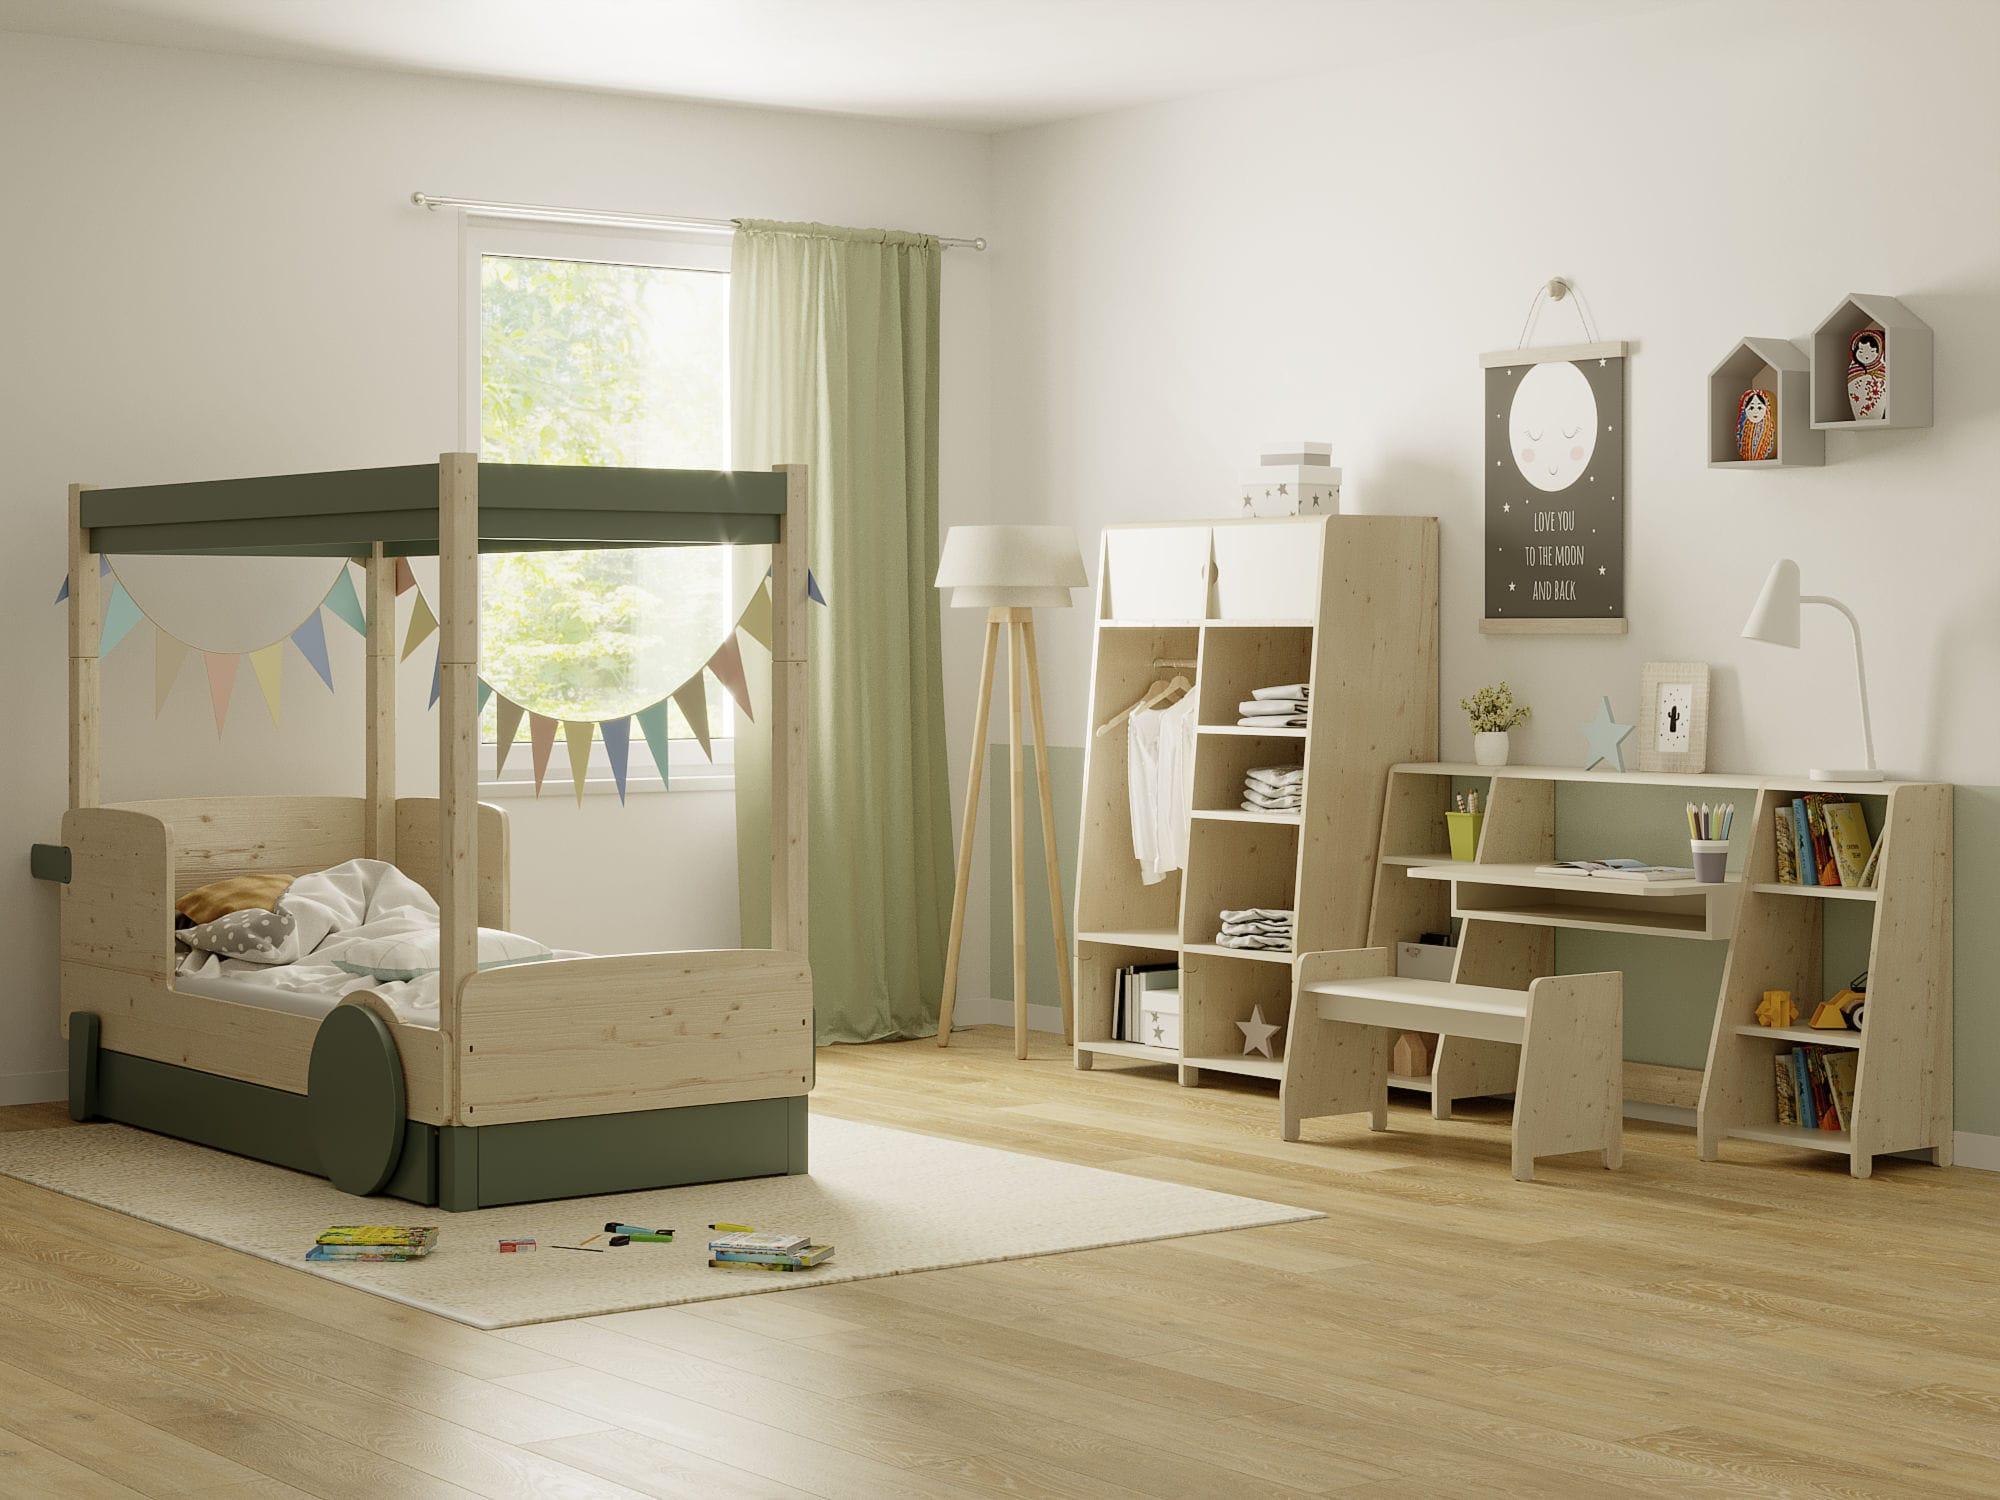 Pine children\'s bedroom furniture set / MDF / lacquered wood ...